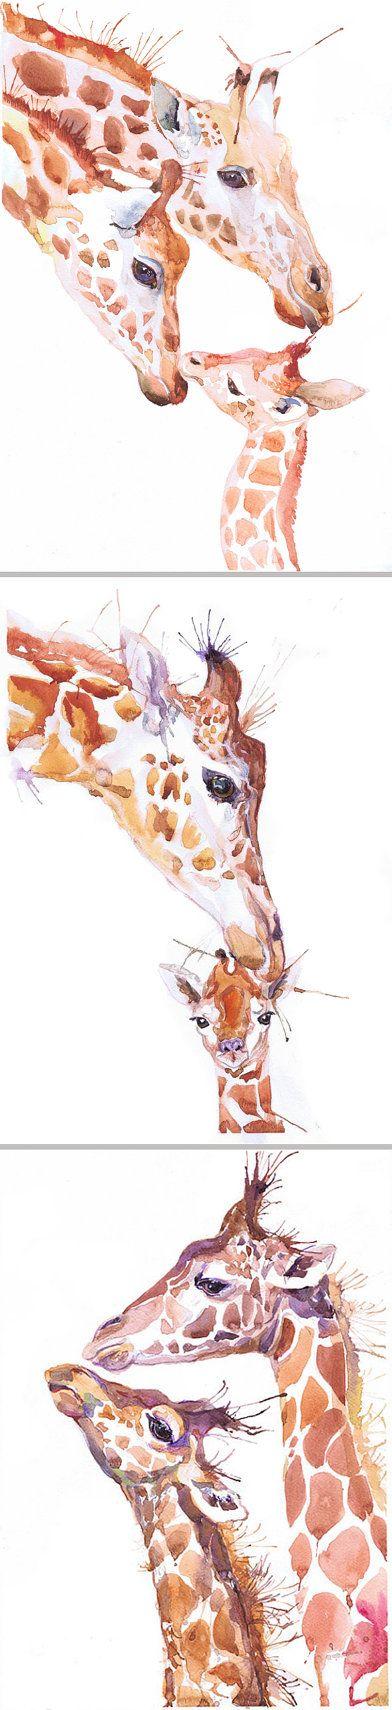 Giraffe art  print, animal art painting, watercolor, nursery, african animals art print, animal art for kids, giraffe drawing, funny giraffe by ValrArt